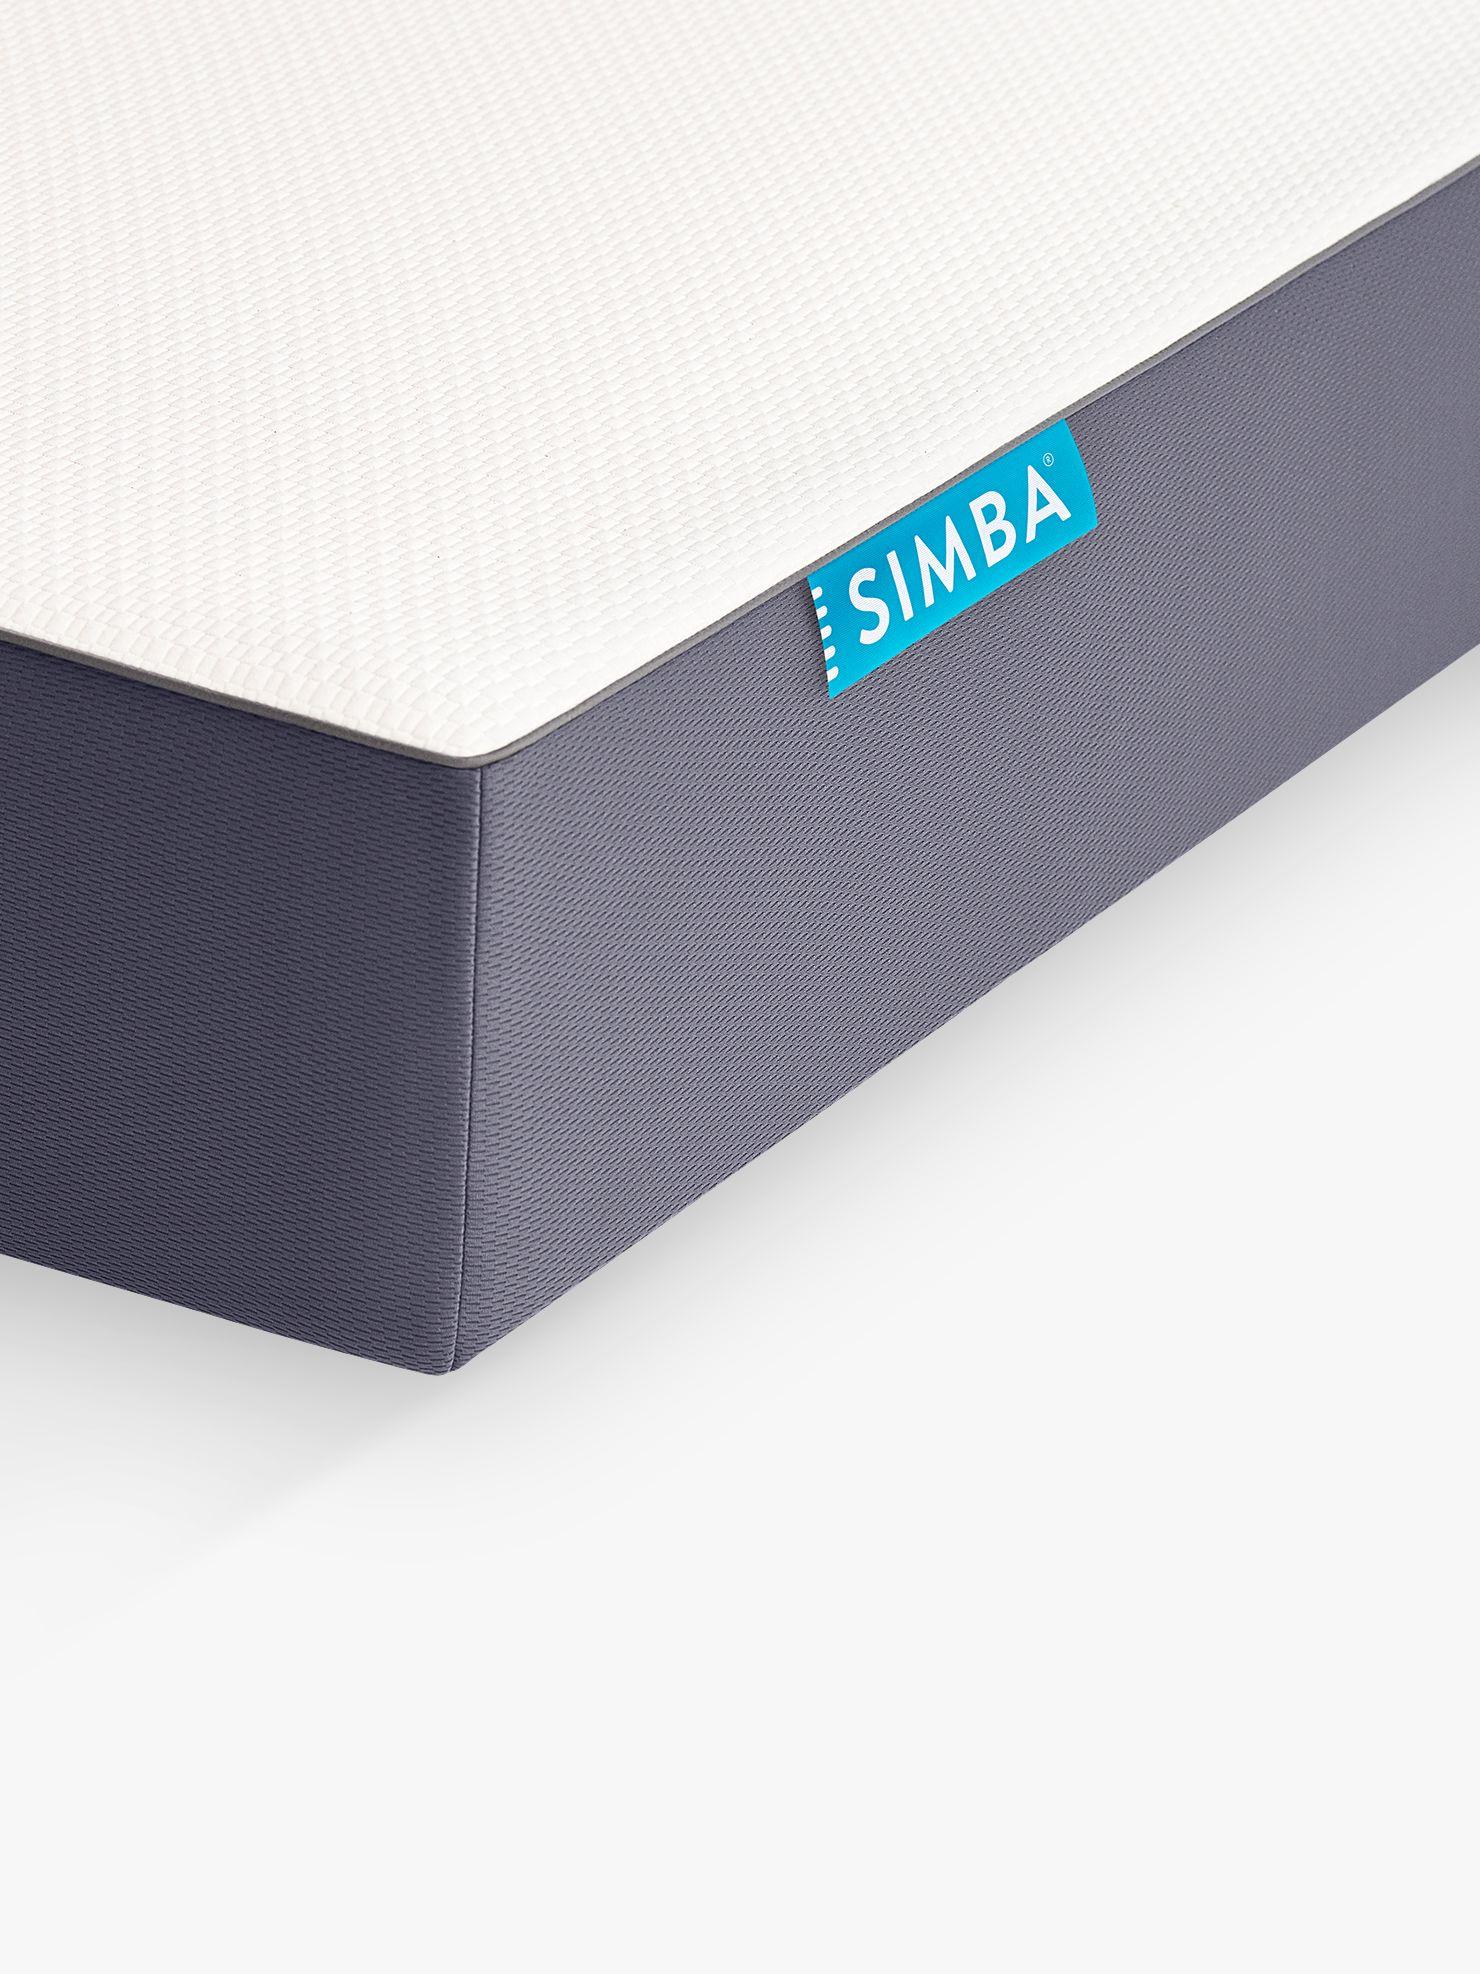 Simba SIMBA Hybrid Memory Foam Pocket Spring Mattress, Single